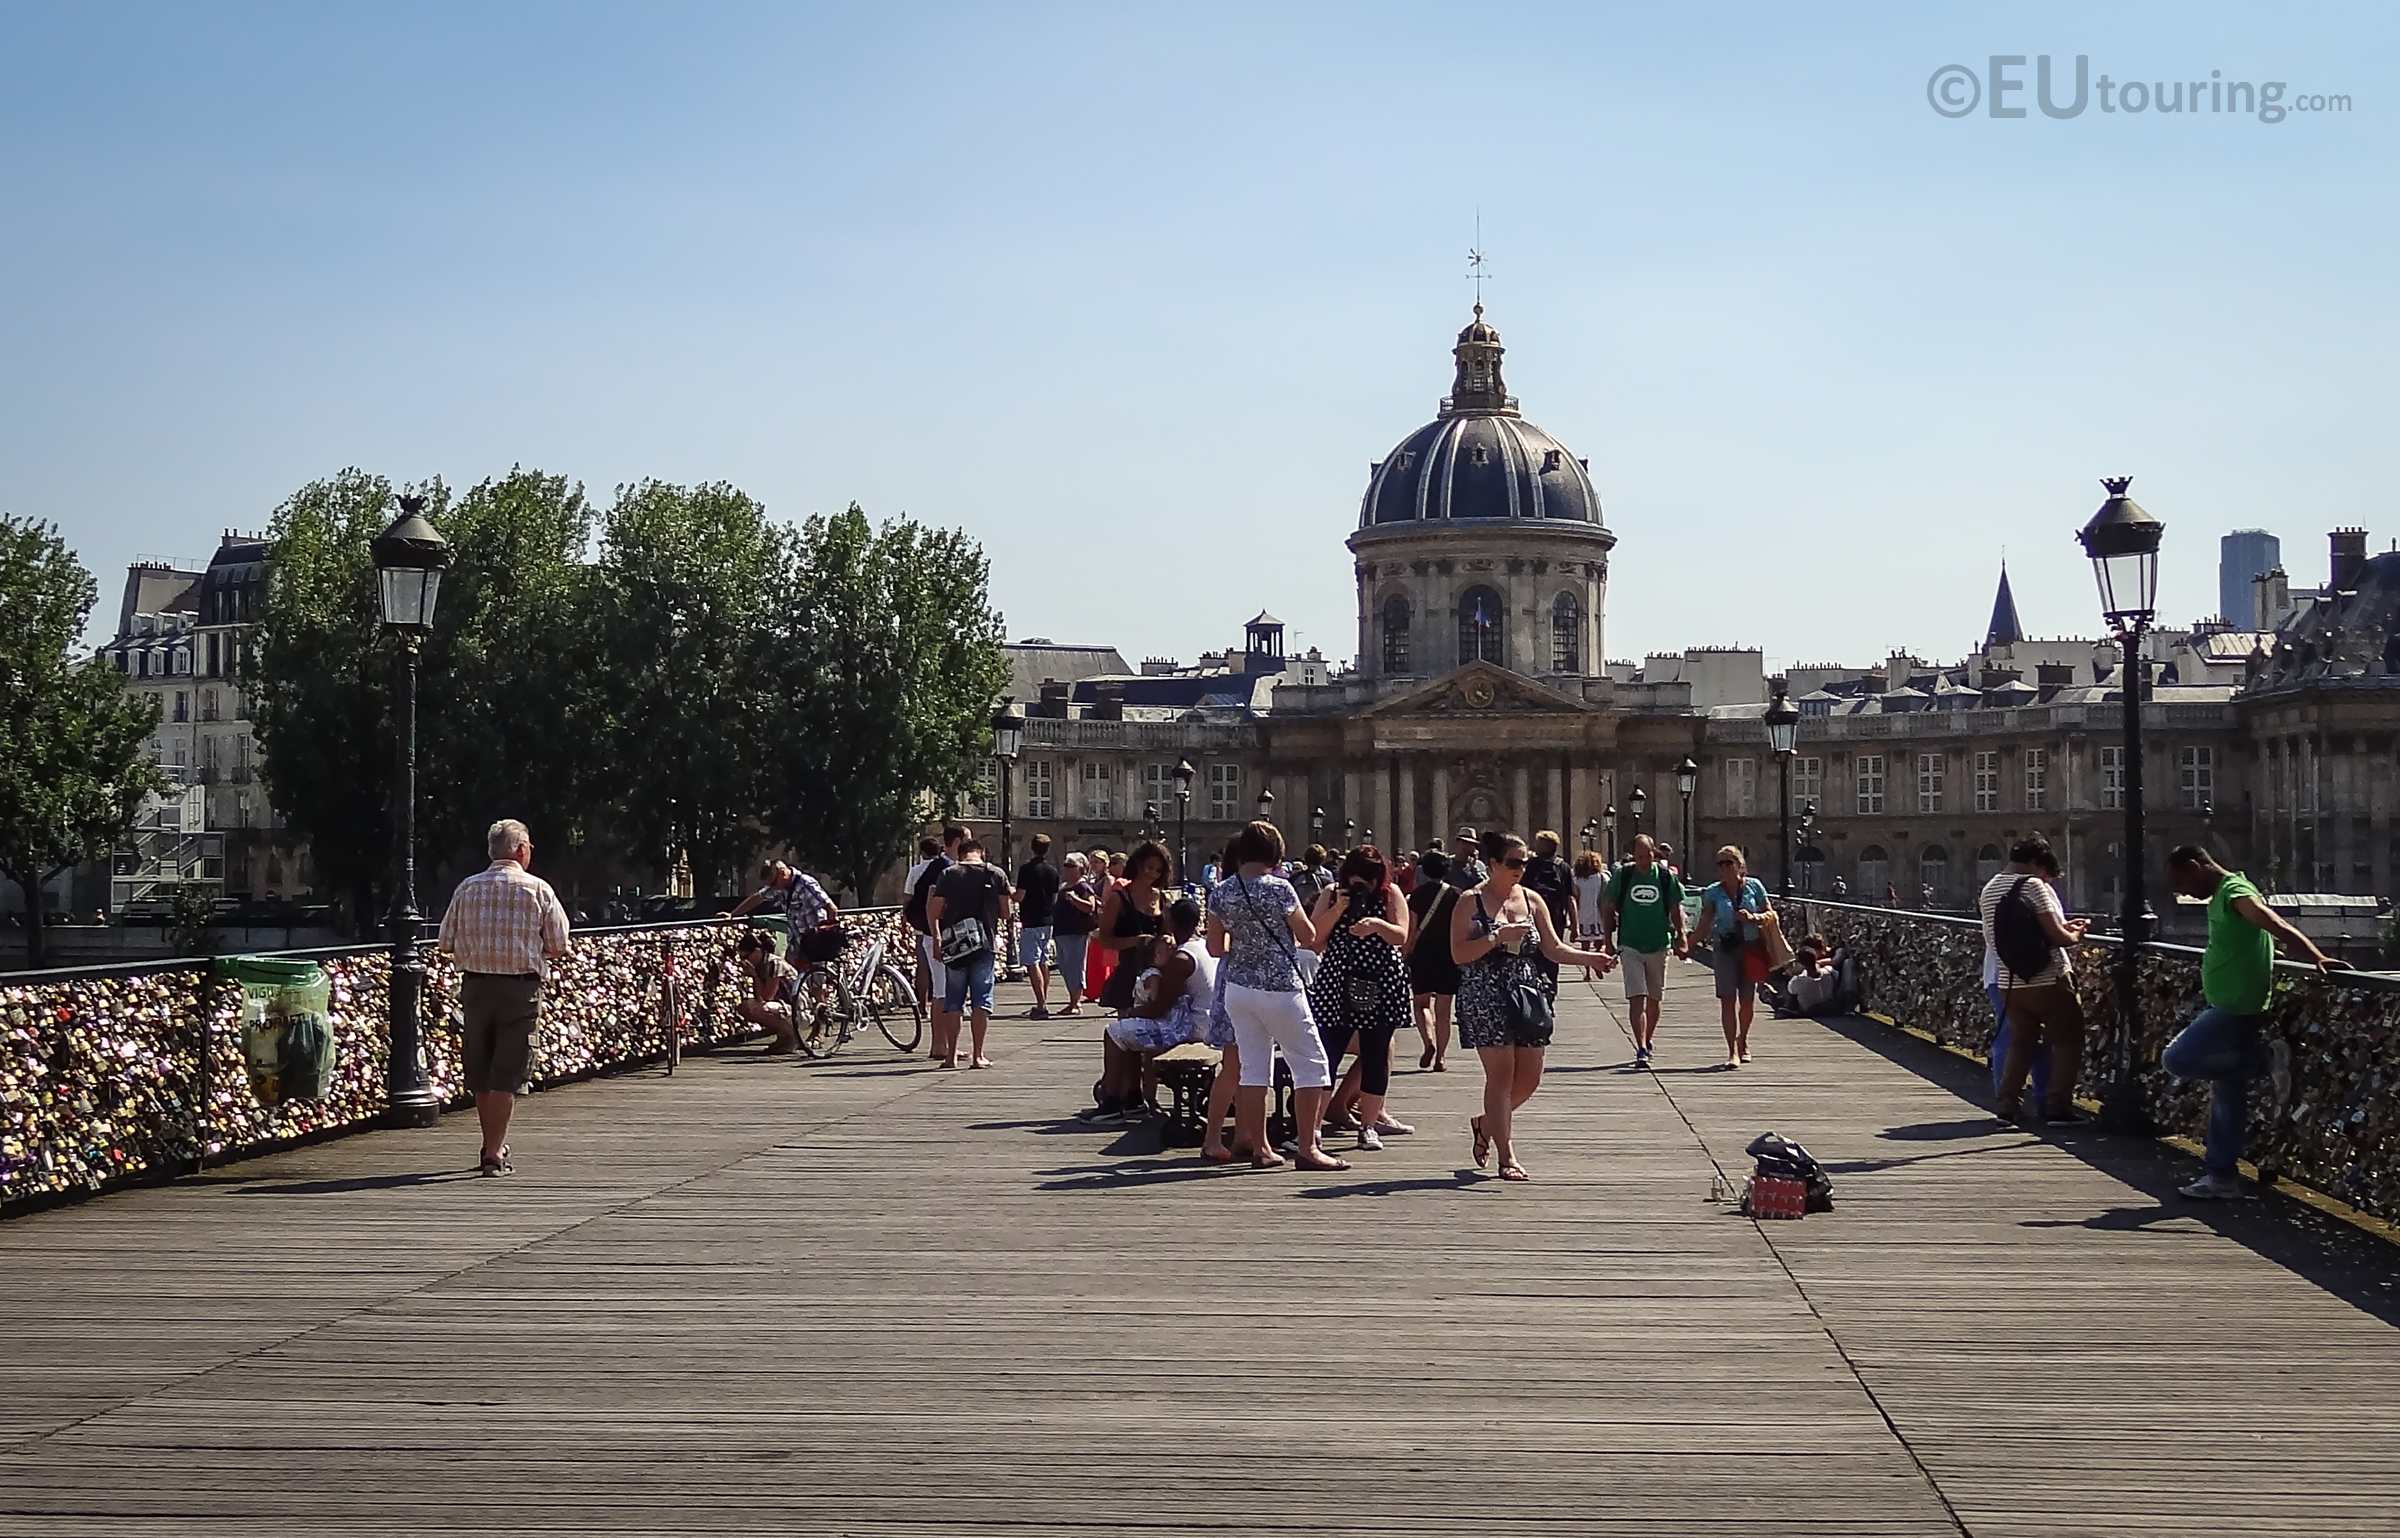 Institut de France from the bridge